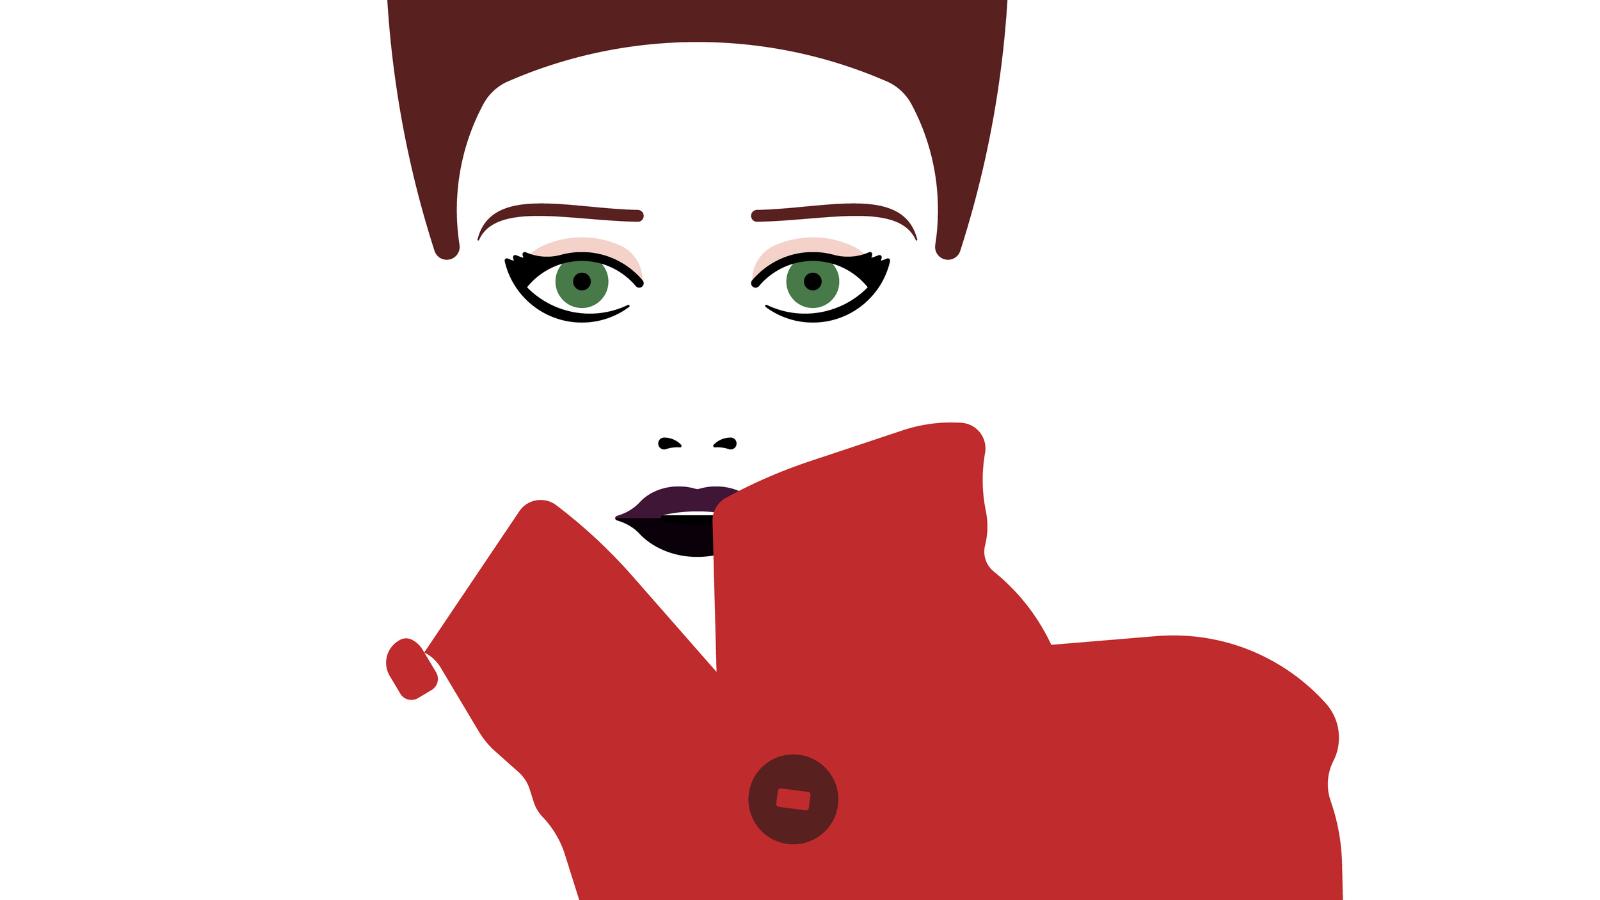 illustrations-05.png